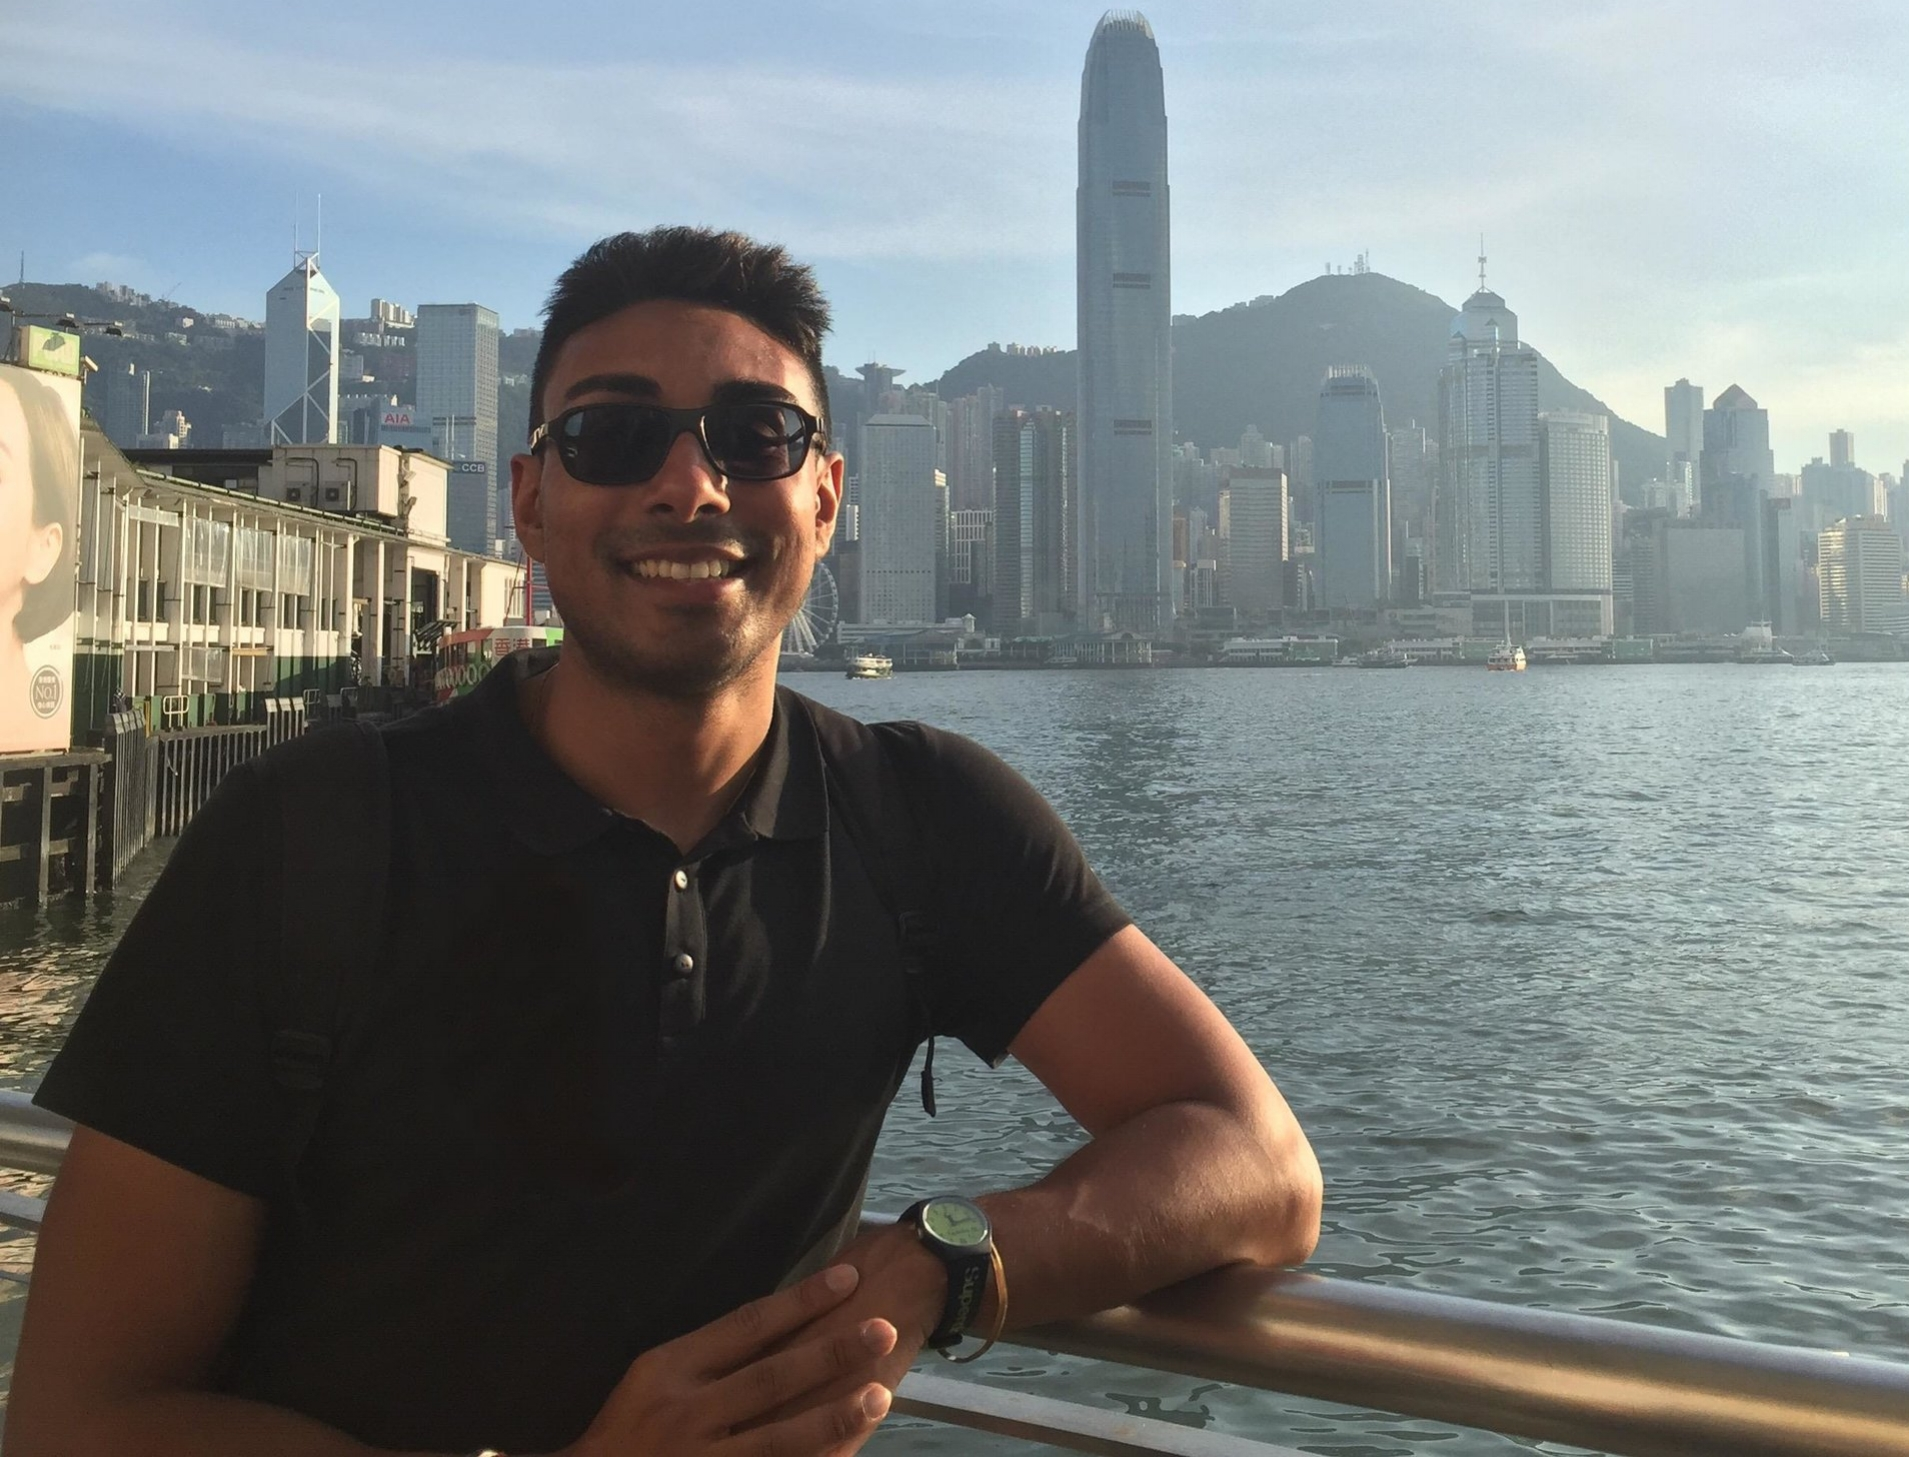 Matty Singh - Dead Pixel Producer/ Editor